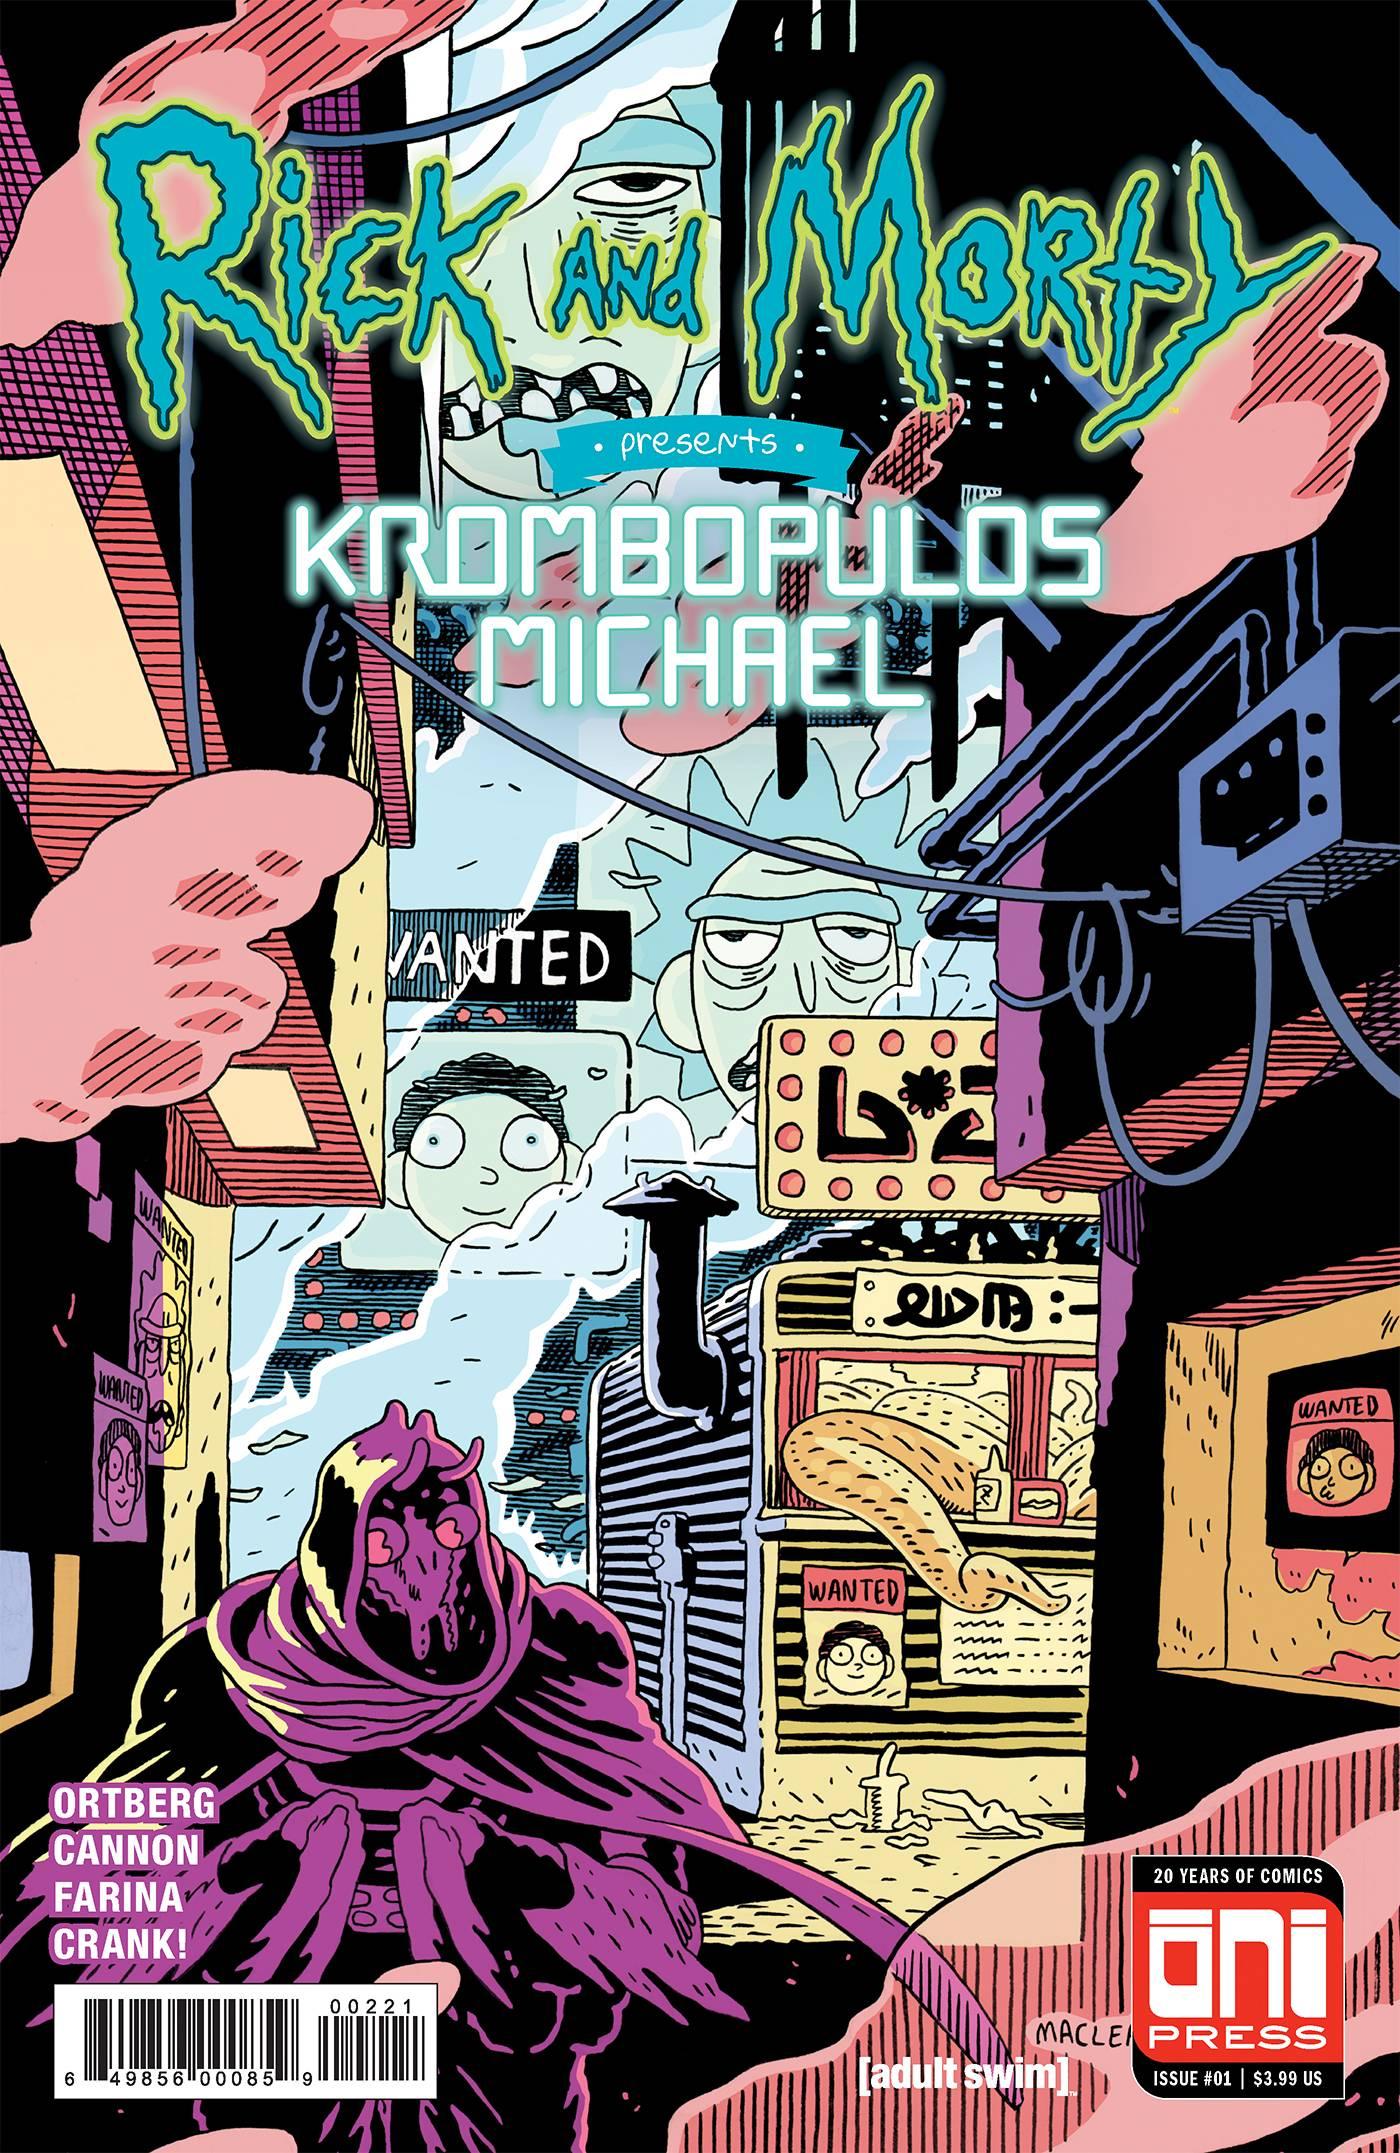 RICK & MORTY PRESENTS KROMBOPULOS MICHAEL #1